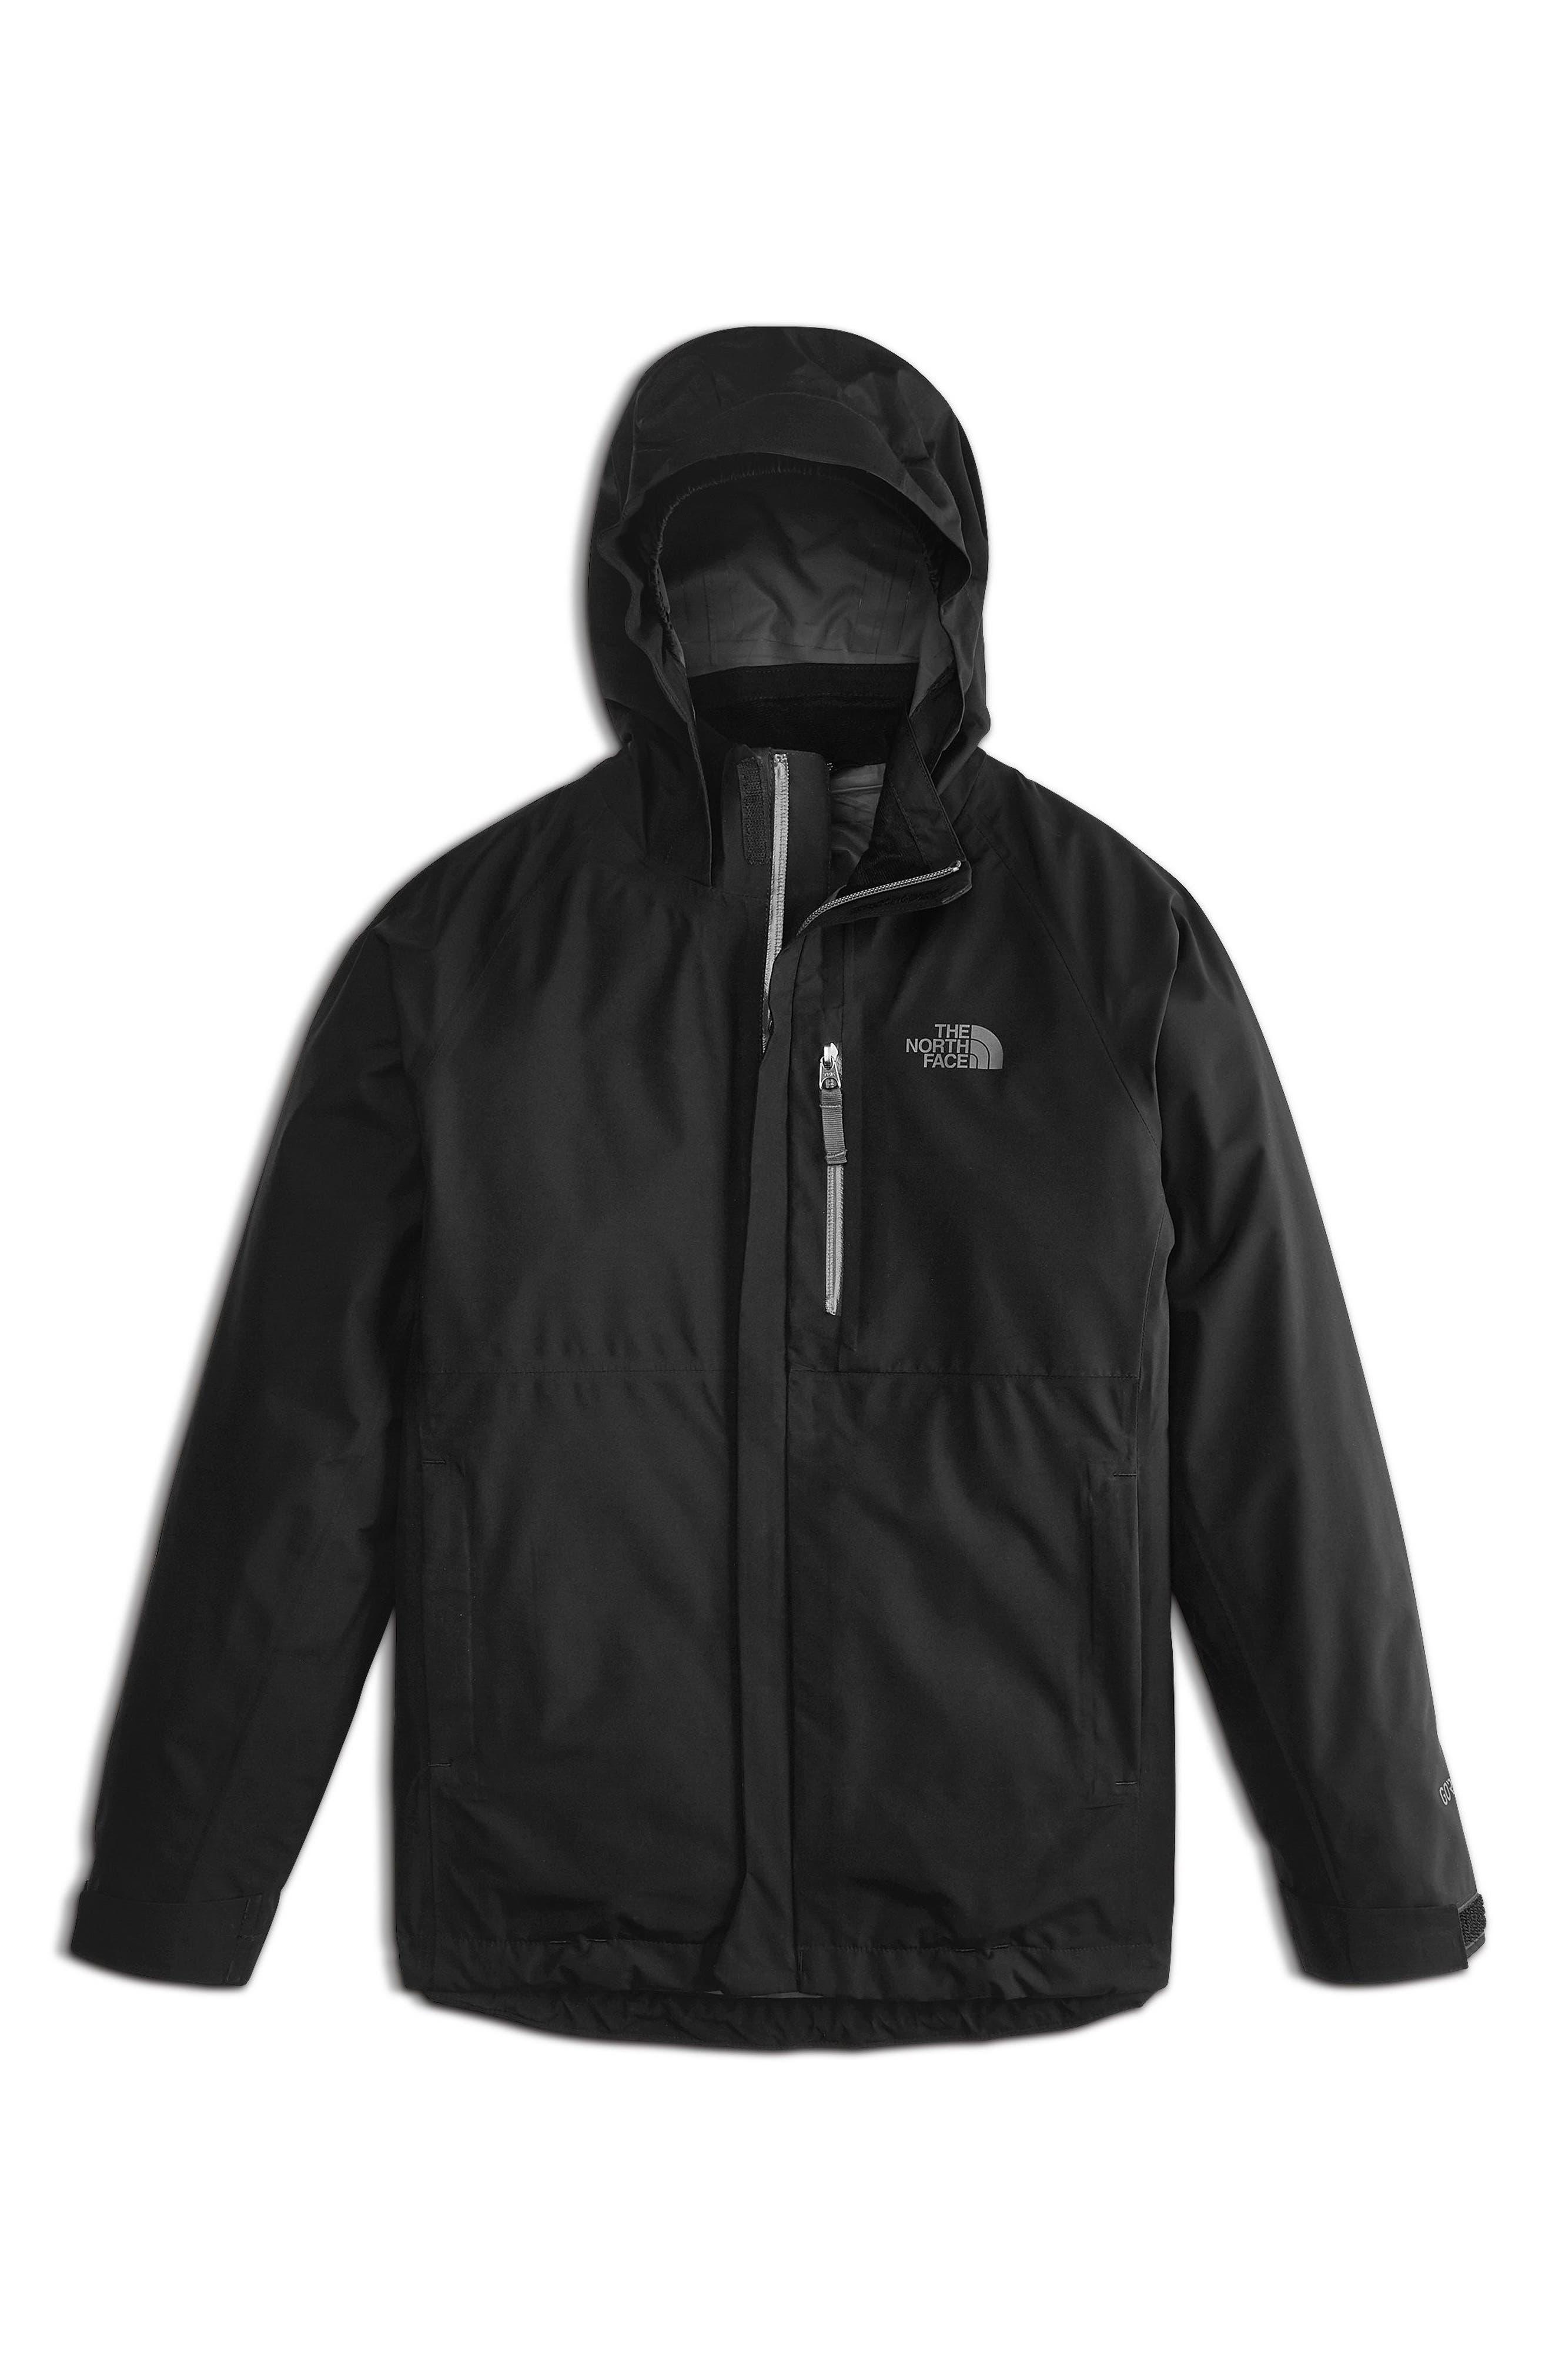 Main Image - The North Face Dryzzle Gore-Tex® Waterproof Jacket (Big Boys)